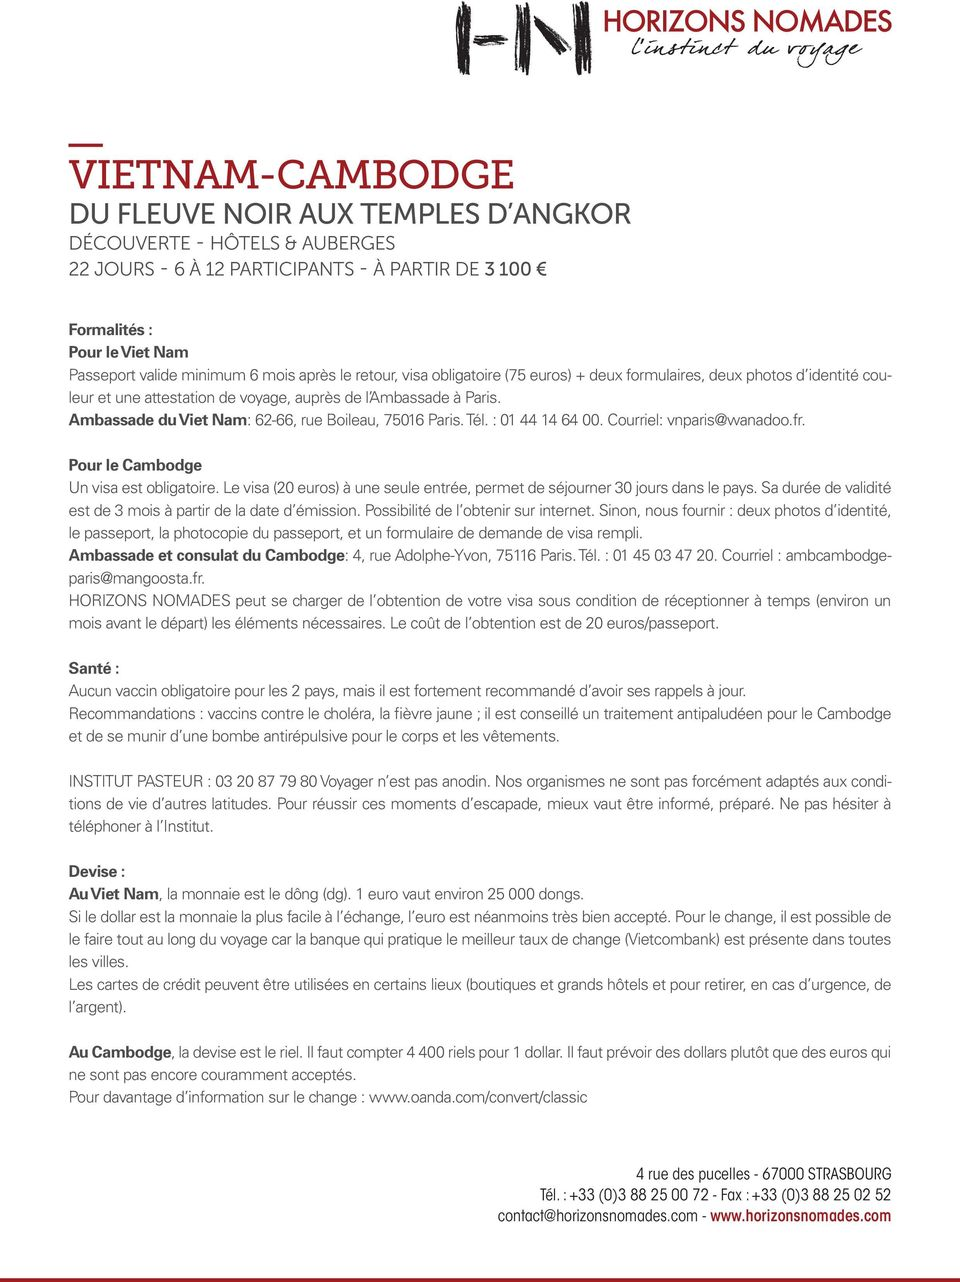 vaccin obligatoire voyage vietnam